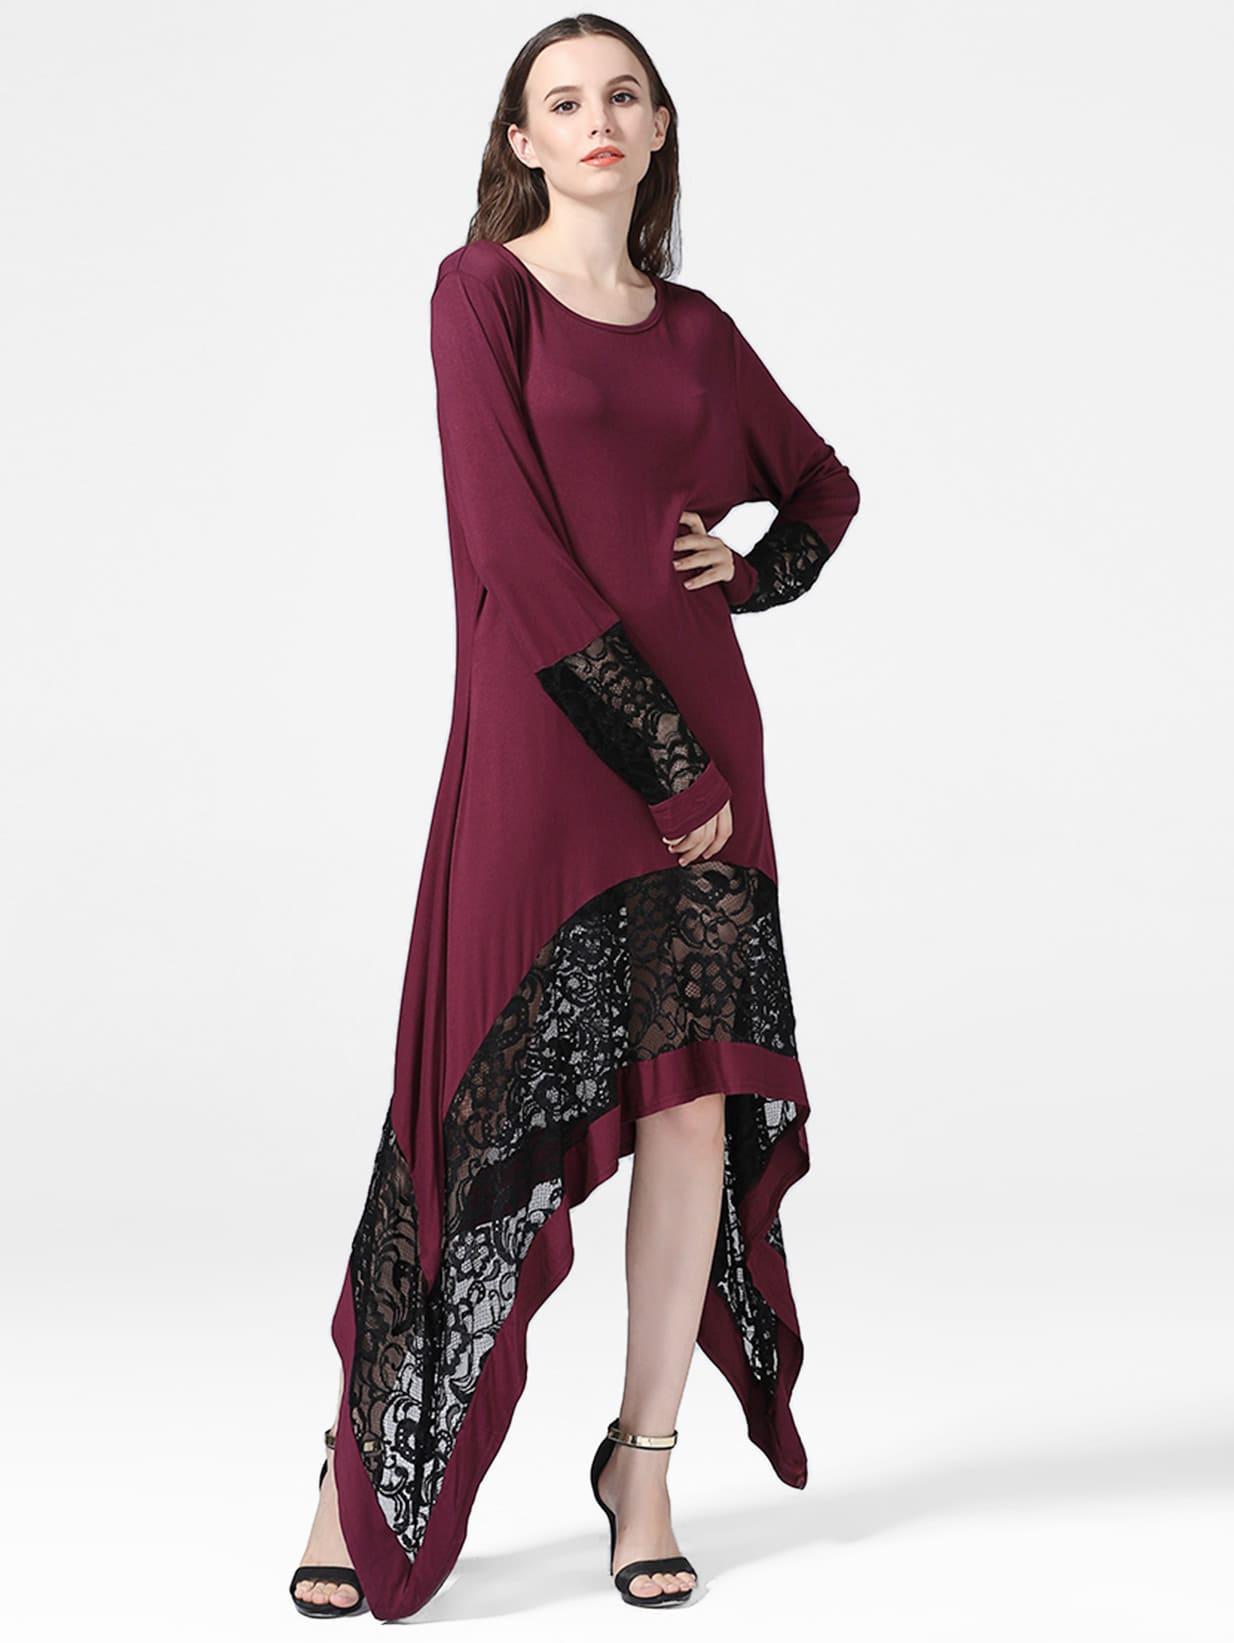 Lace Panel Asymmetric Hem Dress lace design asymmetric hem dress